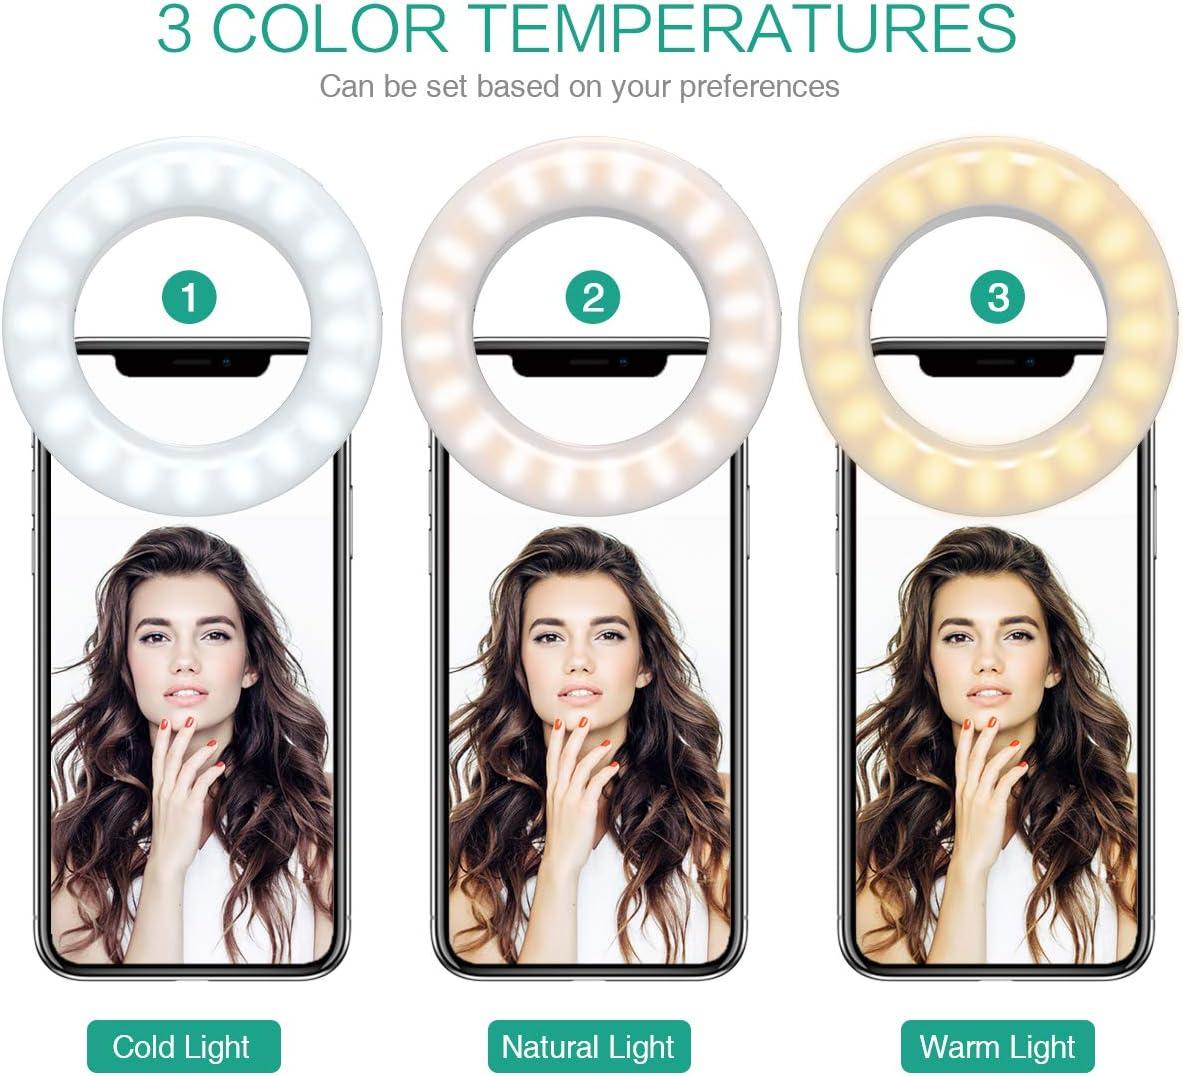 40 LED USB Rechargeable Selfie Fill-Llight 3-Level Adjustable Brightnes LED Circle Light 2 Pack Selfie Ring Light for Smartphone iPad Tablet Supplementary Lighting Night Selfie Enhancing